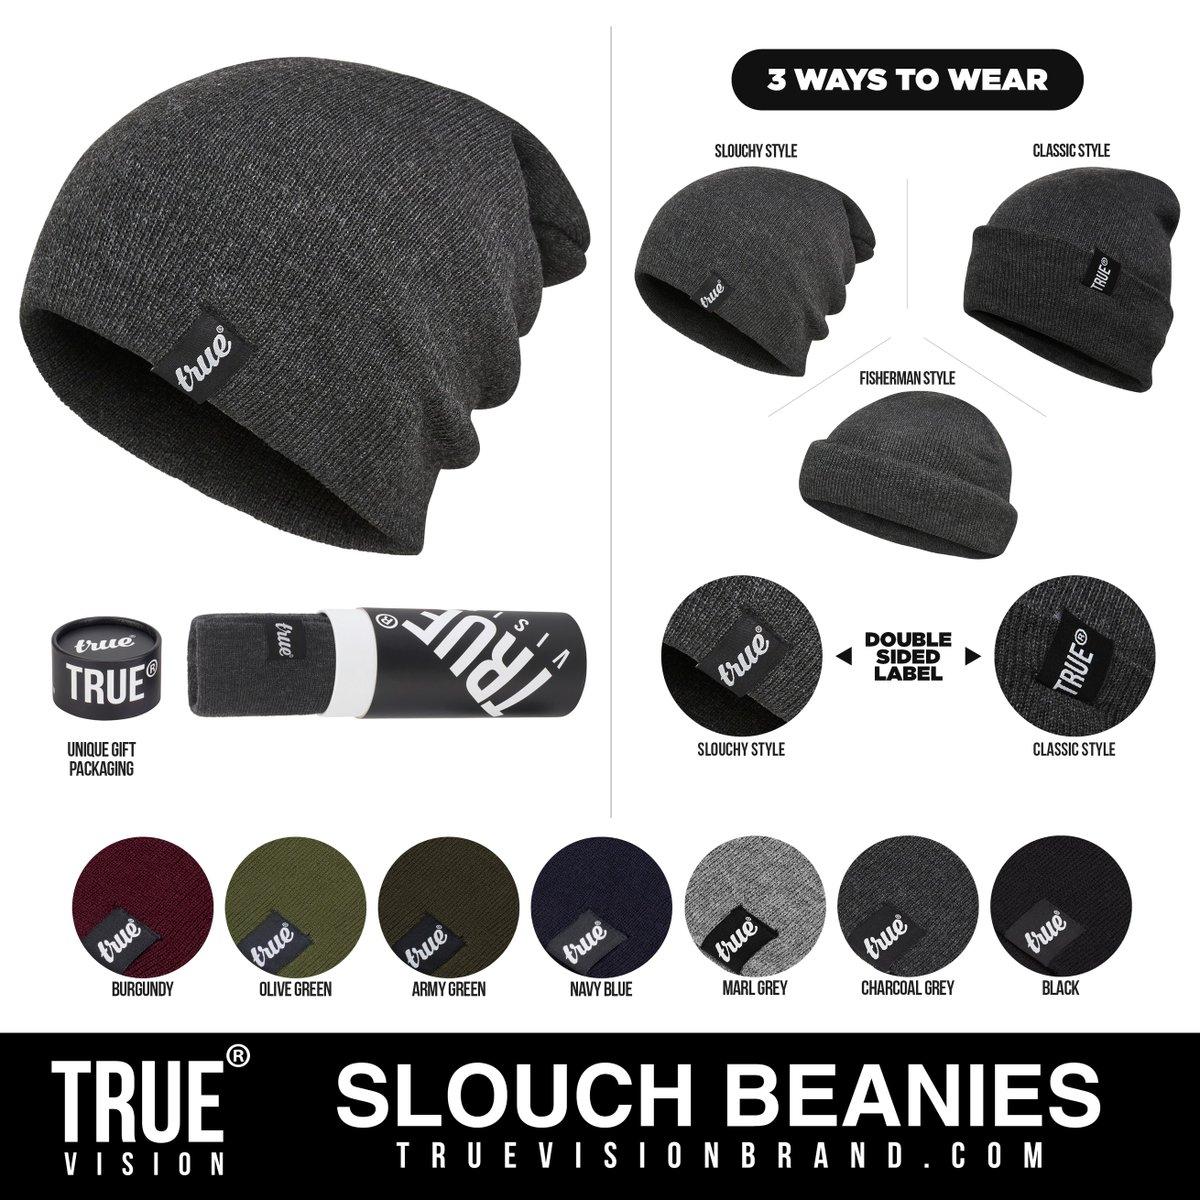 28f1dff05d2 ... Get Yours Here  https   truevisionbrand.com shop slouch-beanie-hat-unisex-burgundy   … (Link In Bio)  truevisionbrand http   www.truevisionbrand.com ...